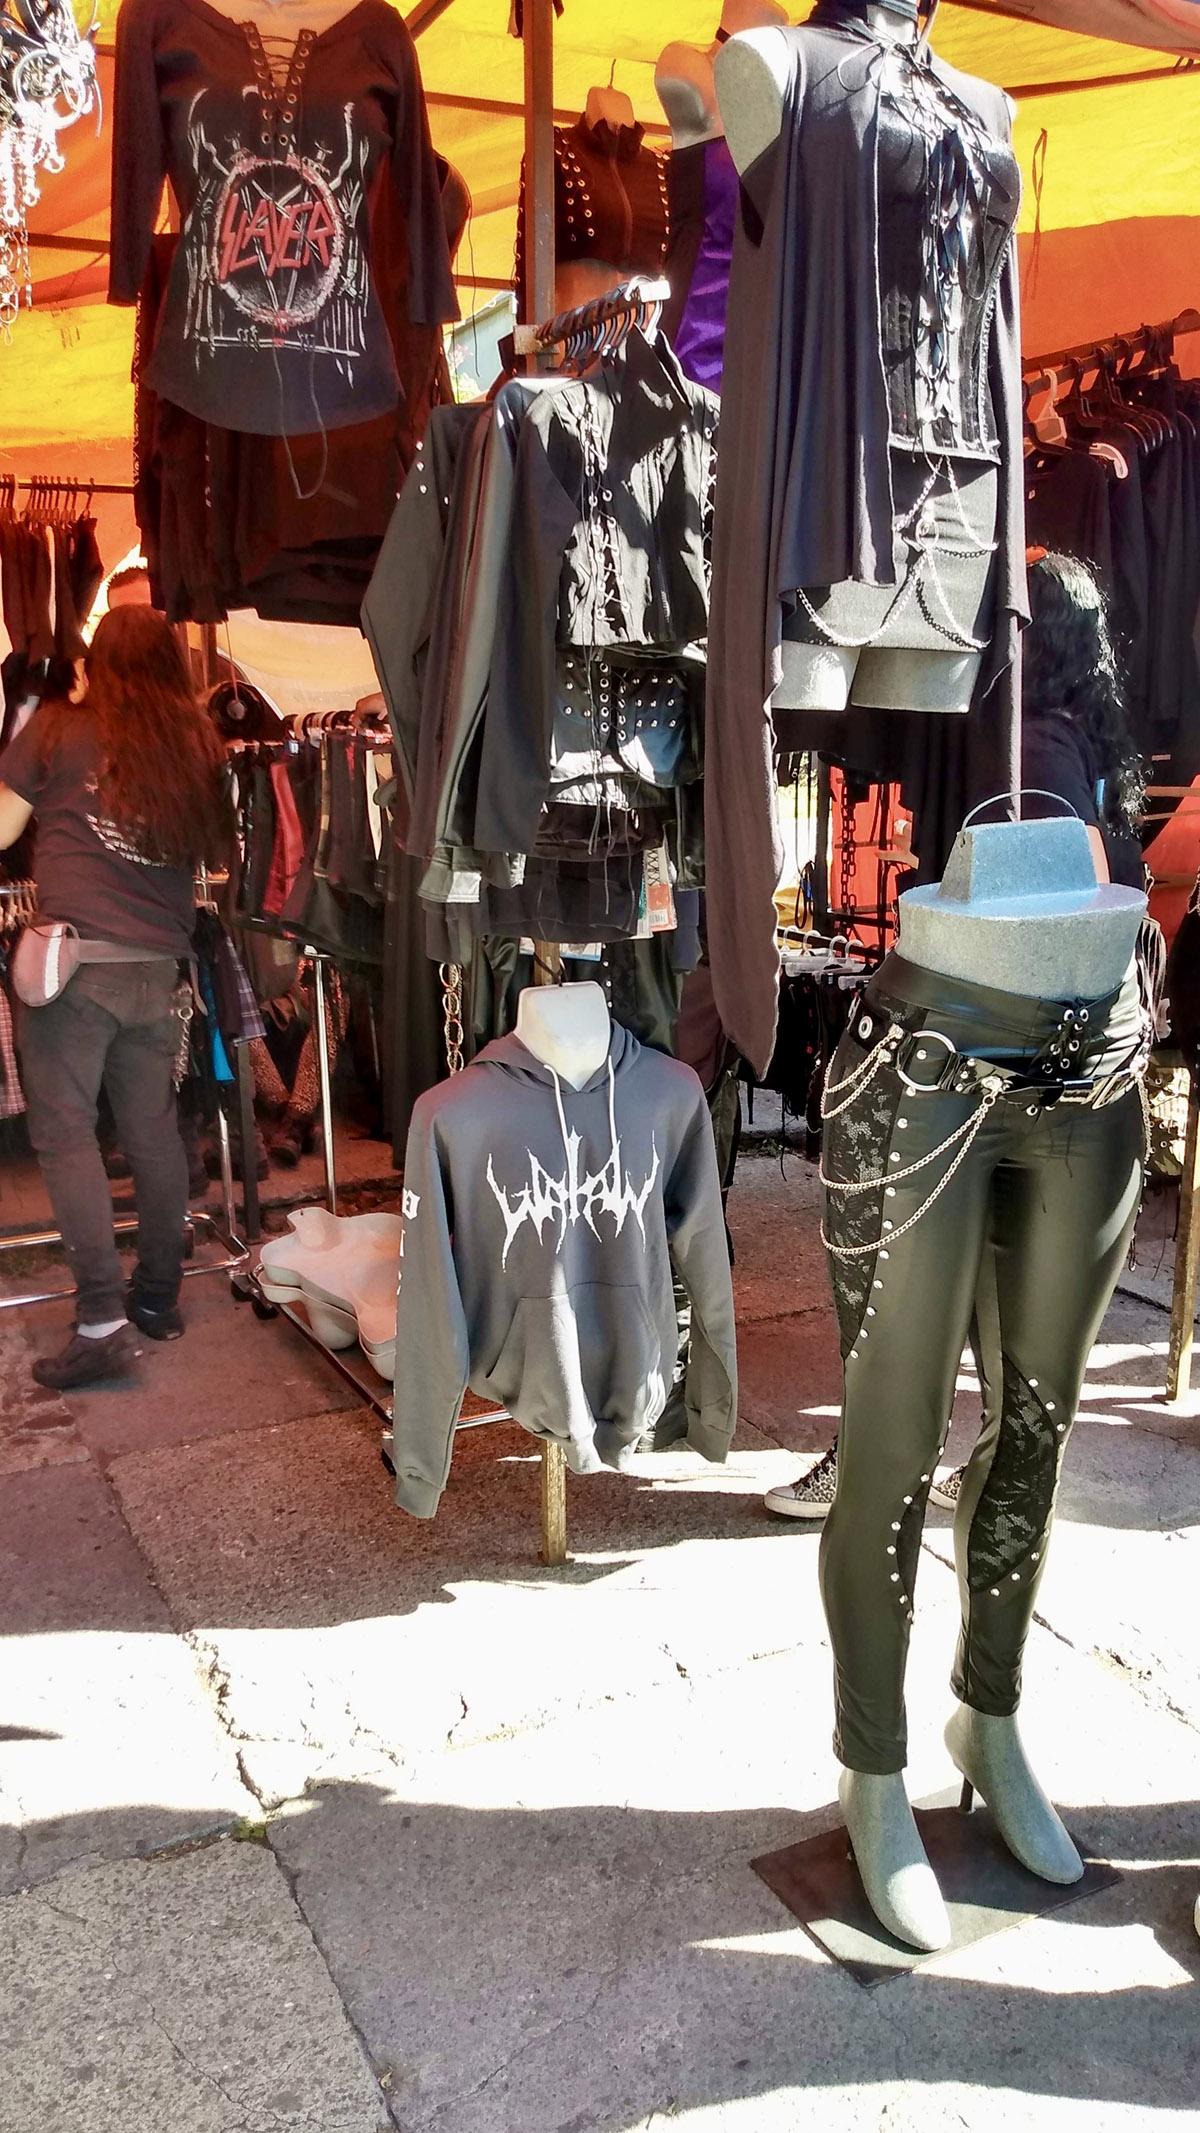 tianguis cultural flea market leather alternative clothing